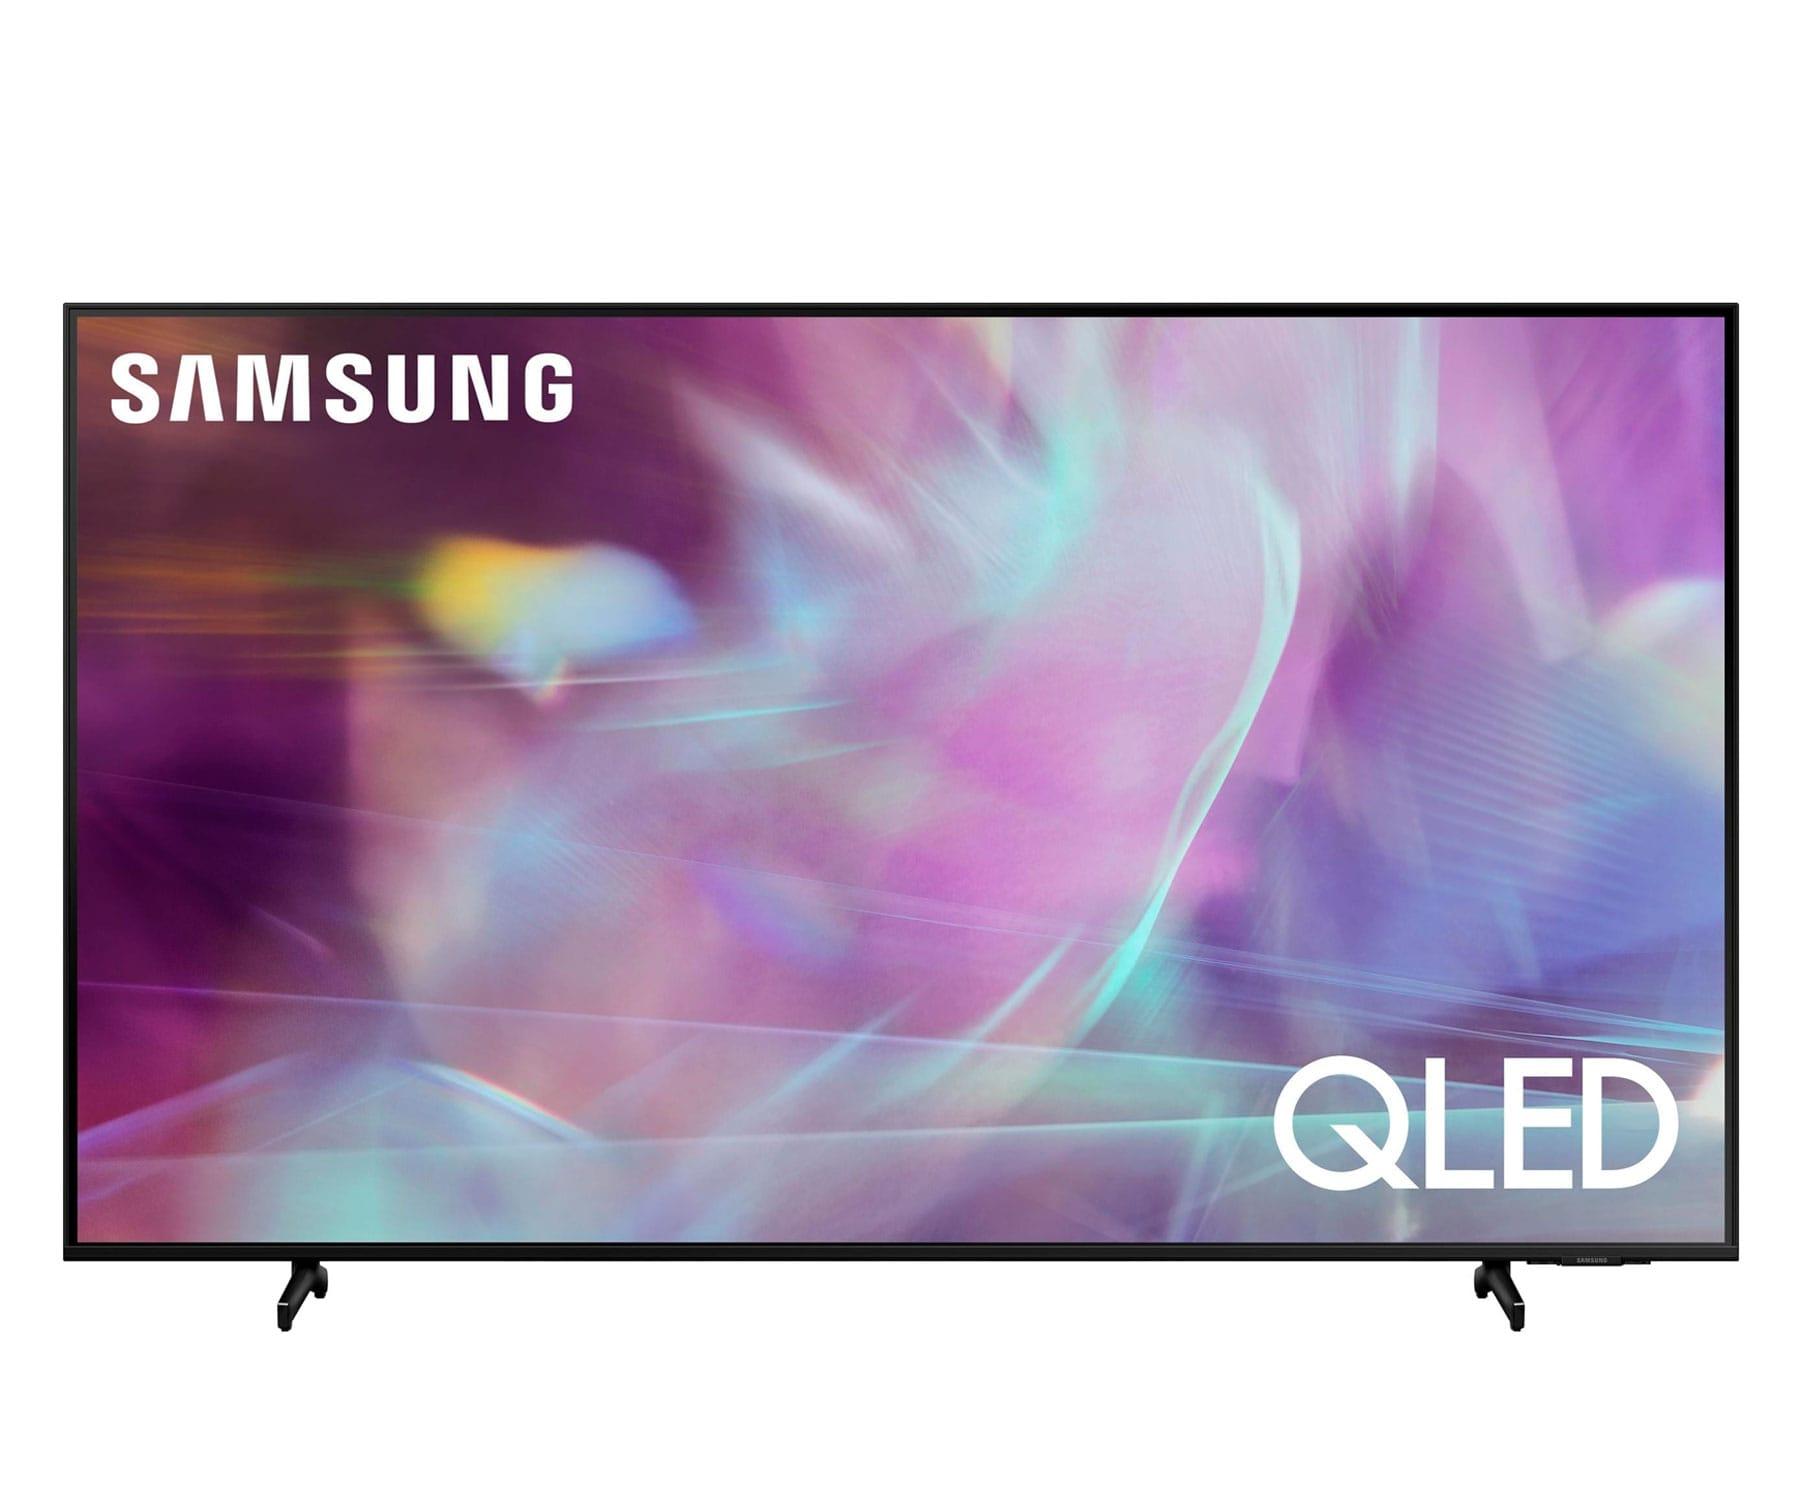 SAMSUNG QE65Q60AAUXXC NEGRO TELEVISOR 65'' QLED 4K SMART TV WIFI BLUETOOTH AMBIENT MODE